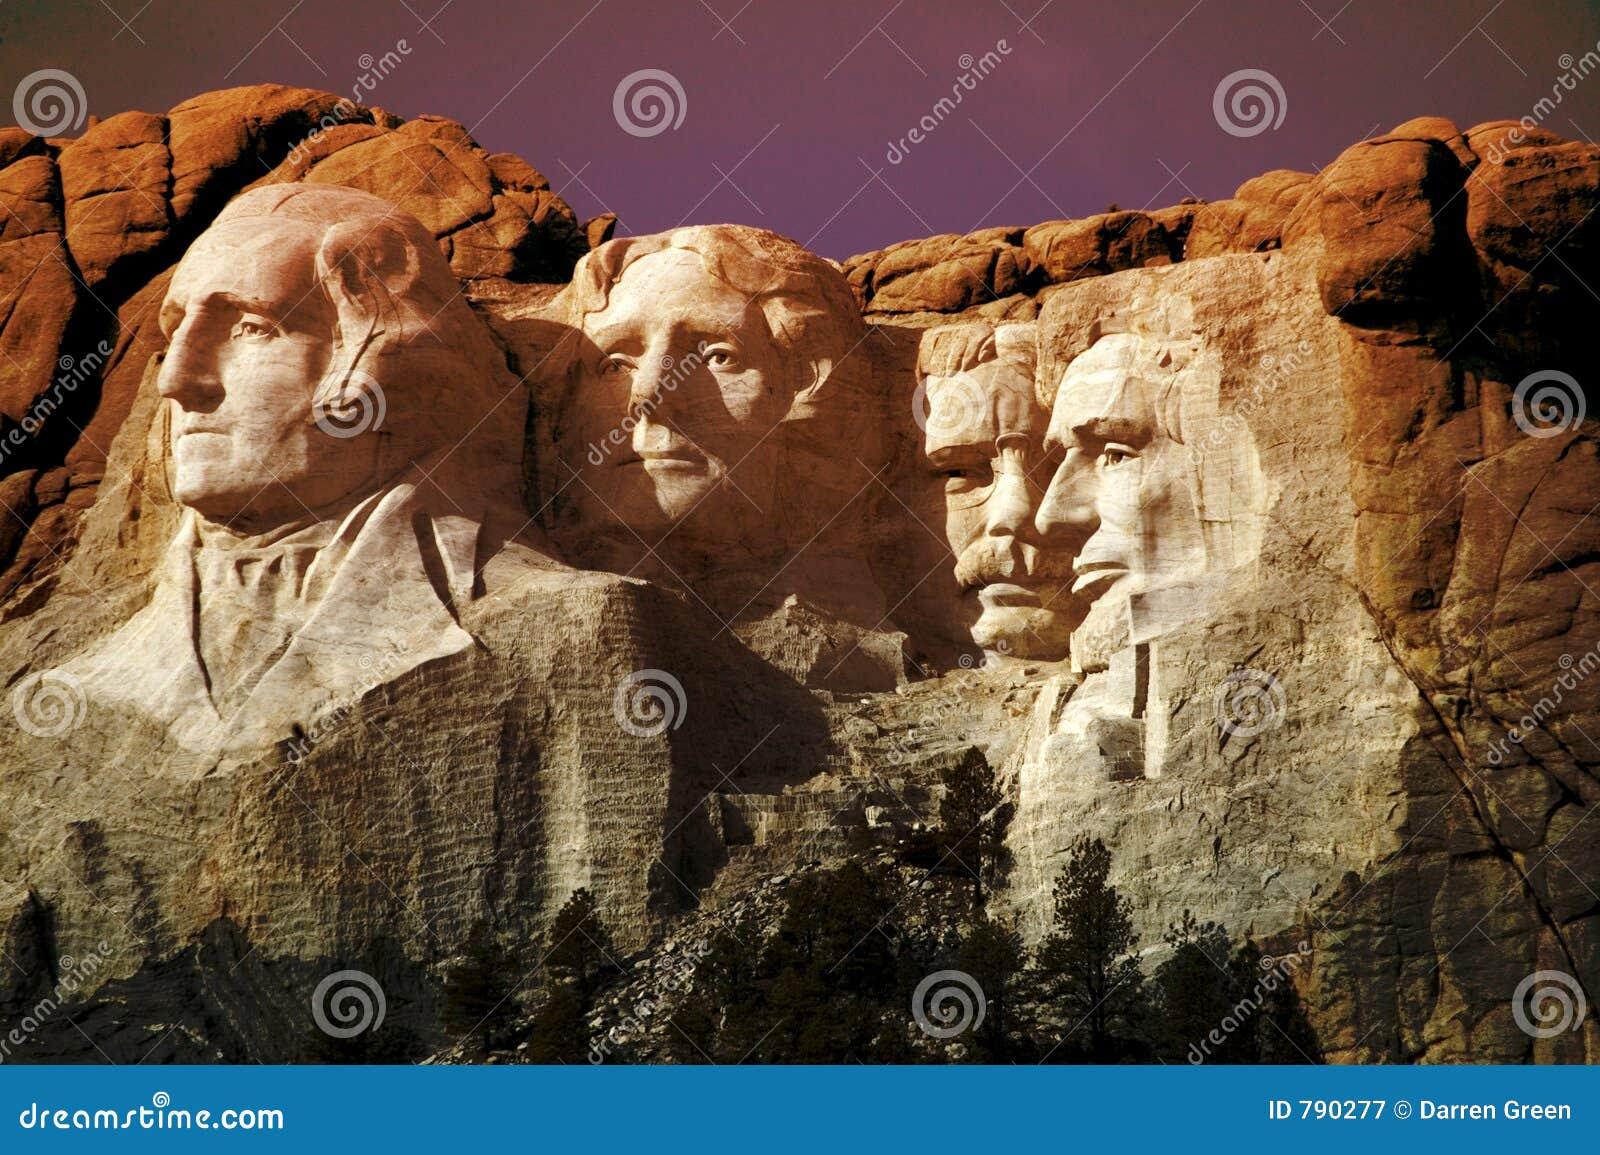 Foto del montaje Rushmore, Dakota del Sur